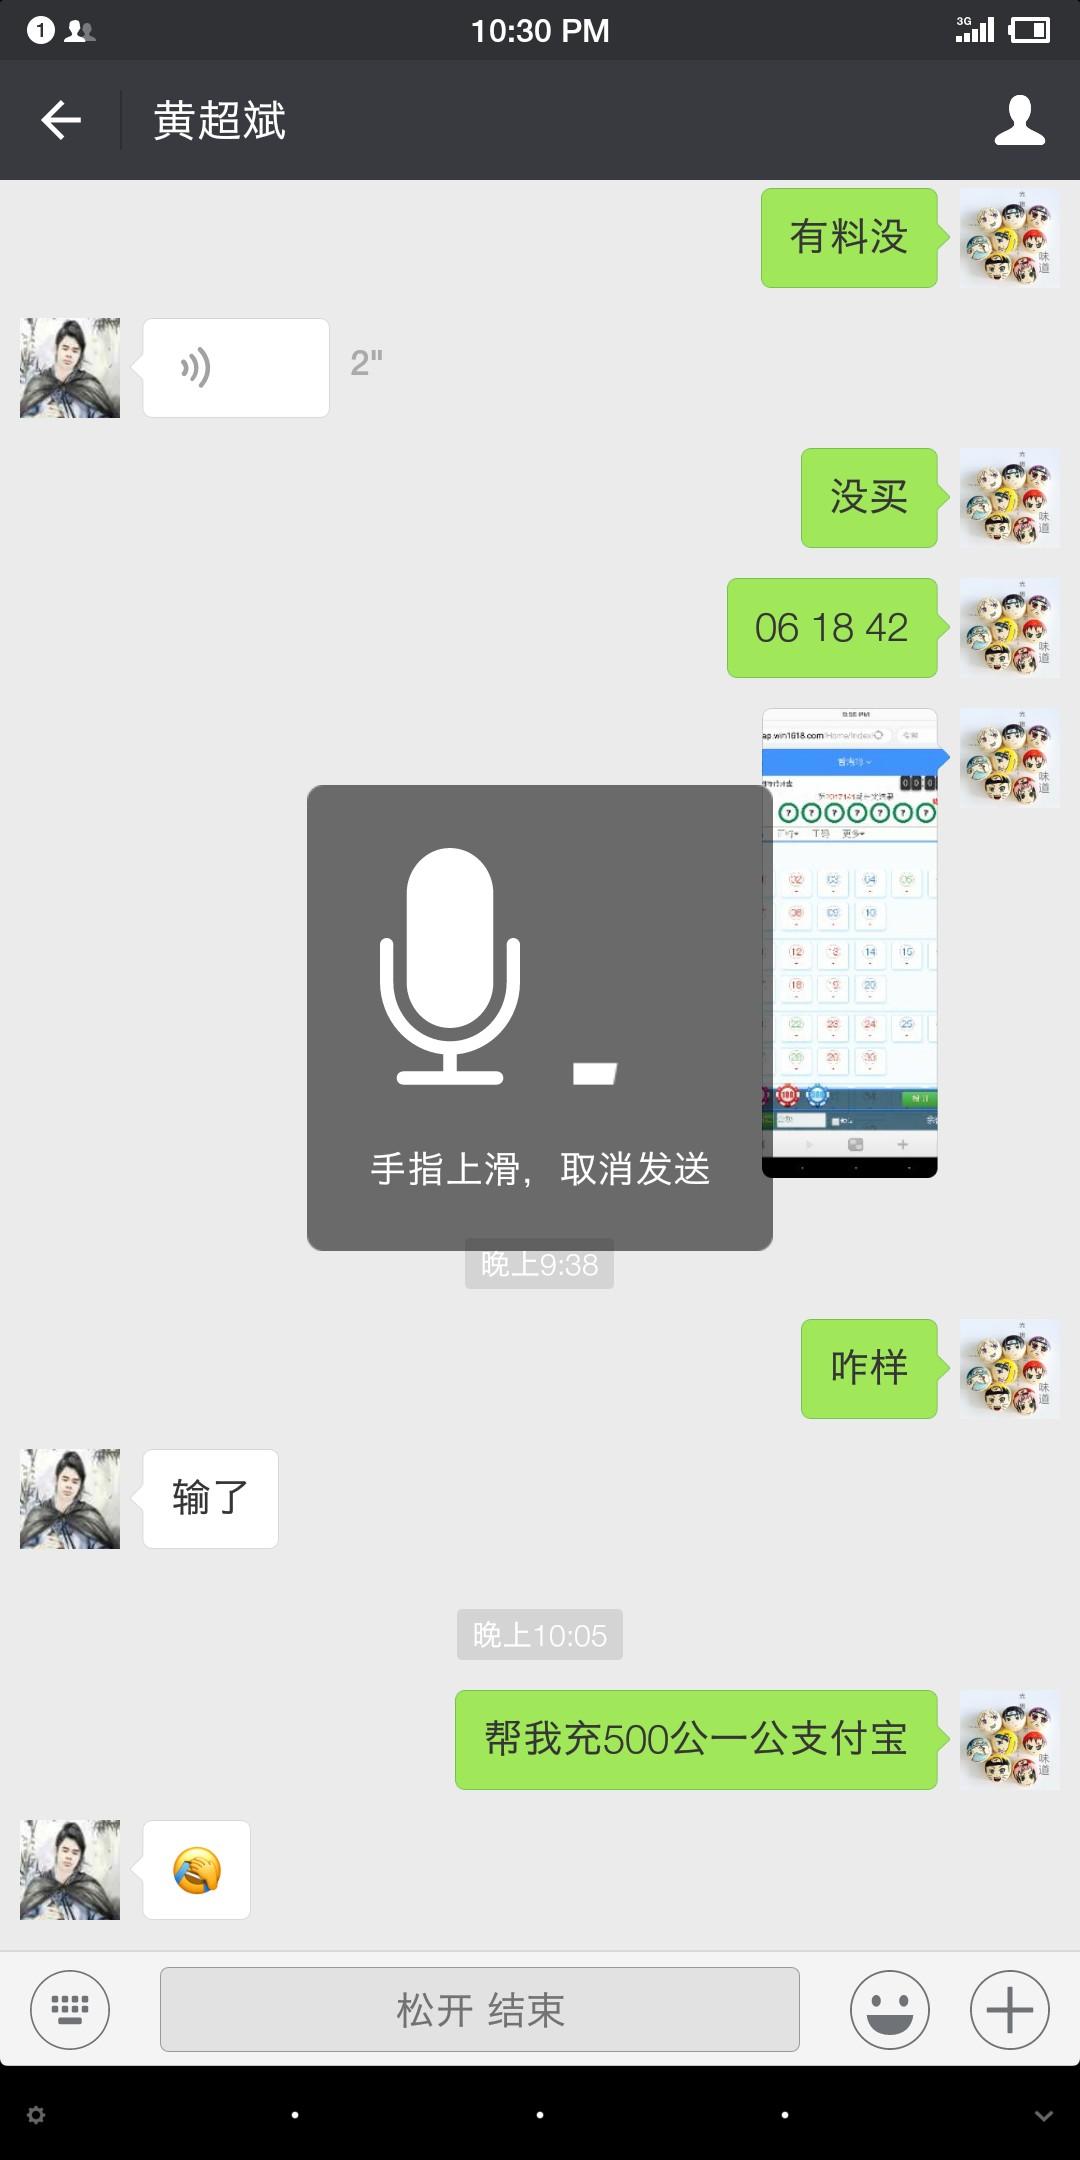 Screenshot_2017-12-02-22-30-47-717_??.png